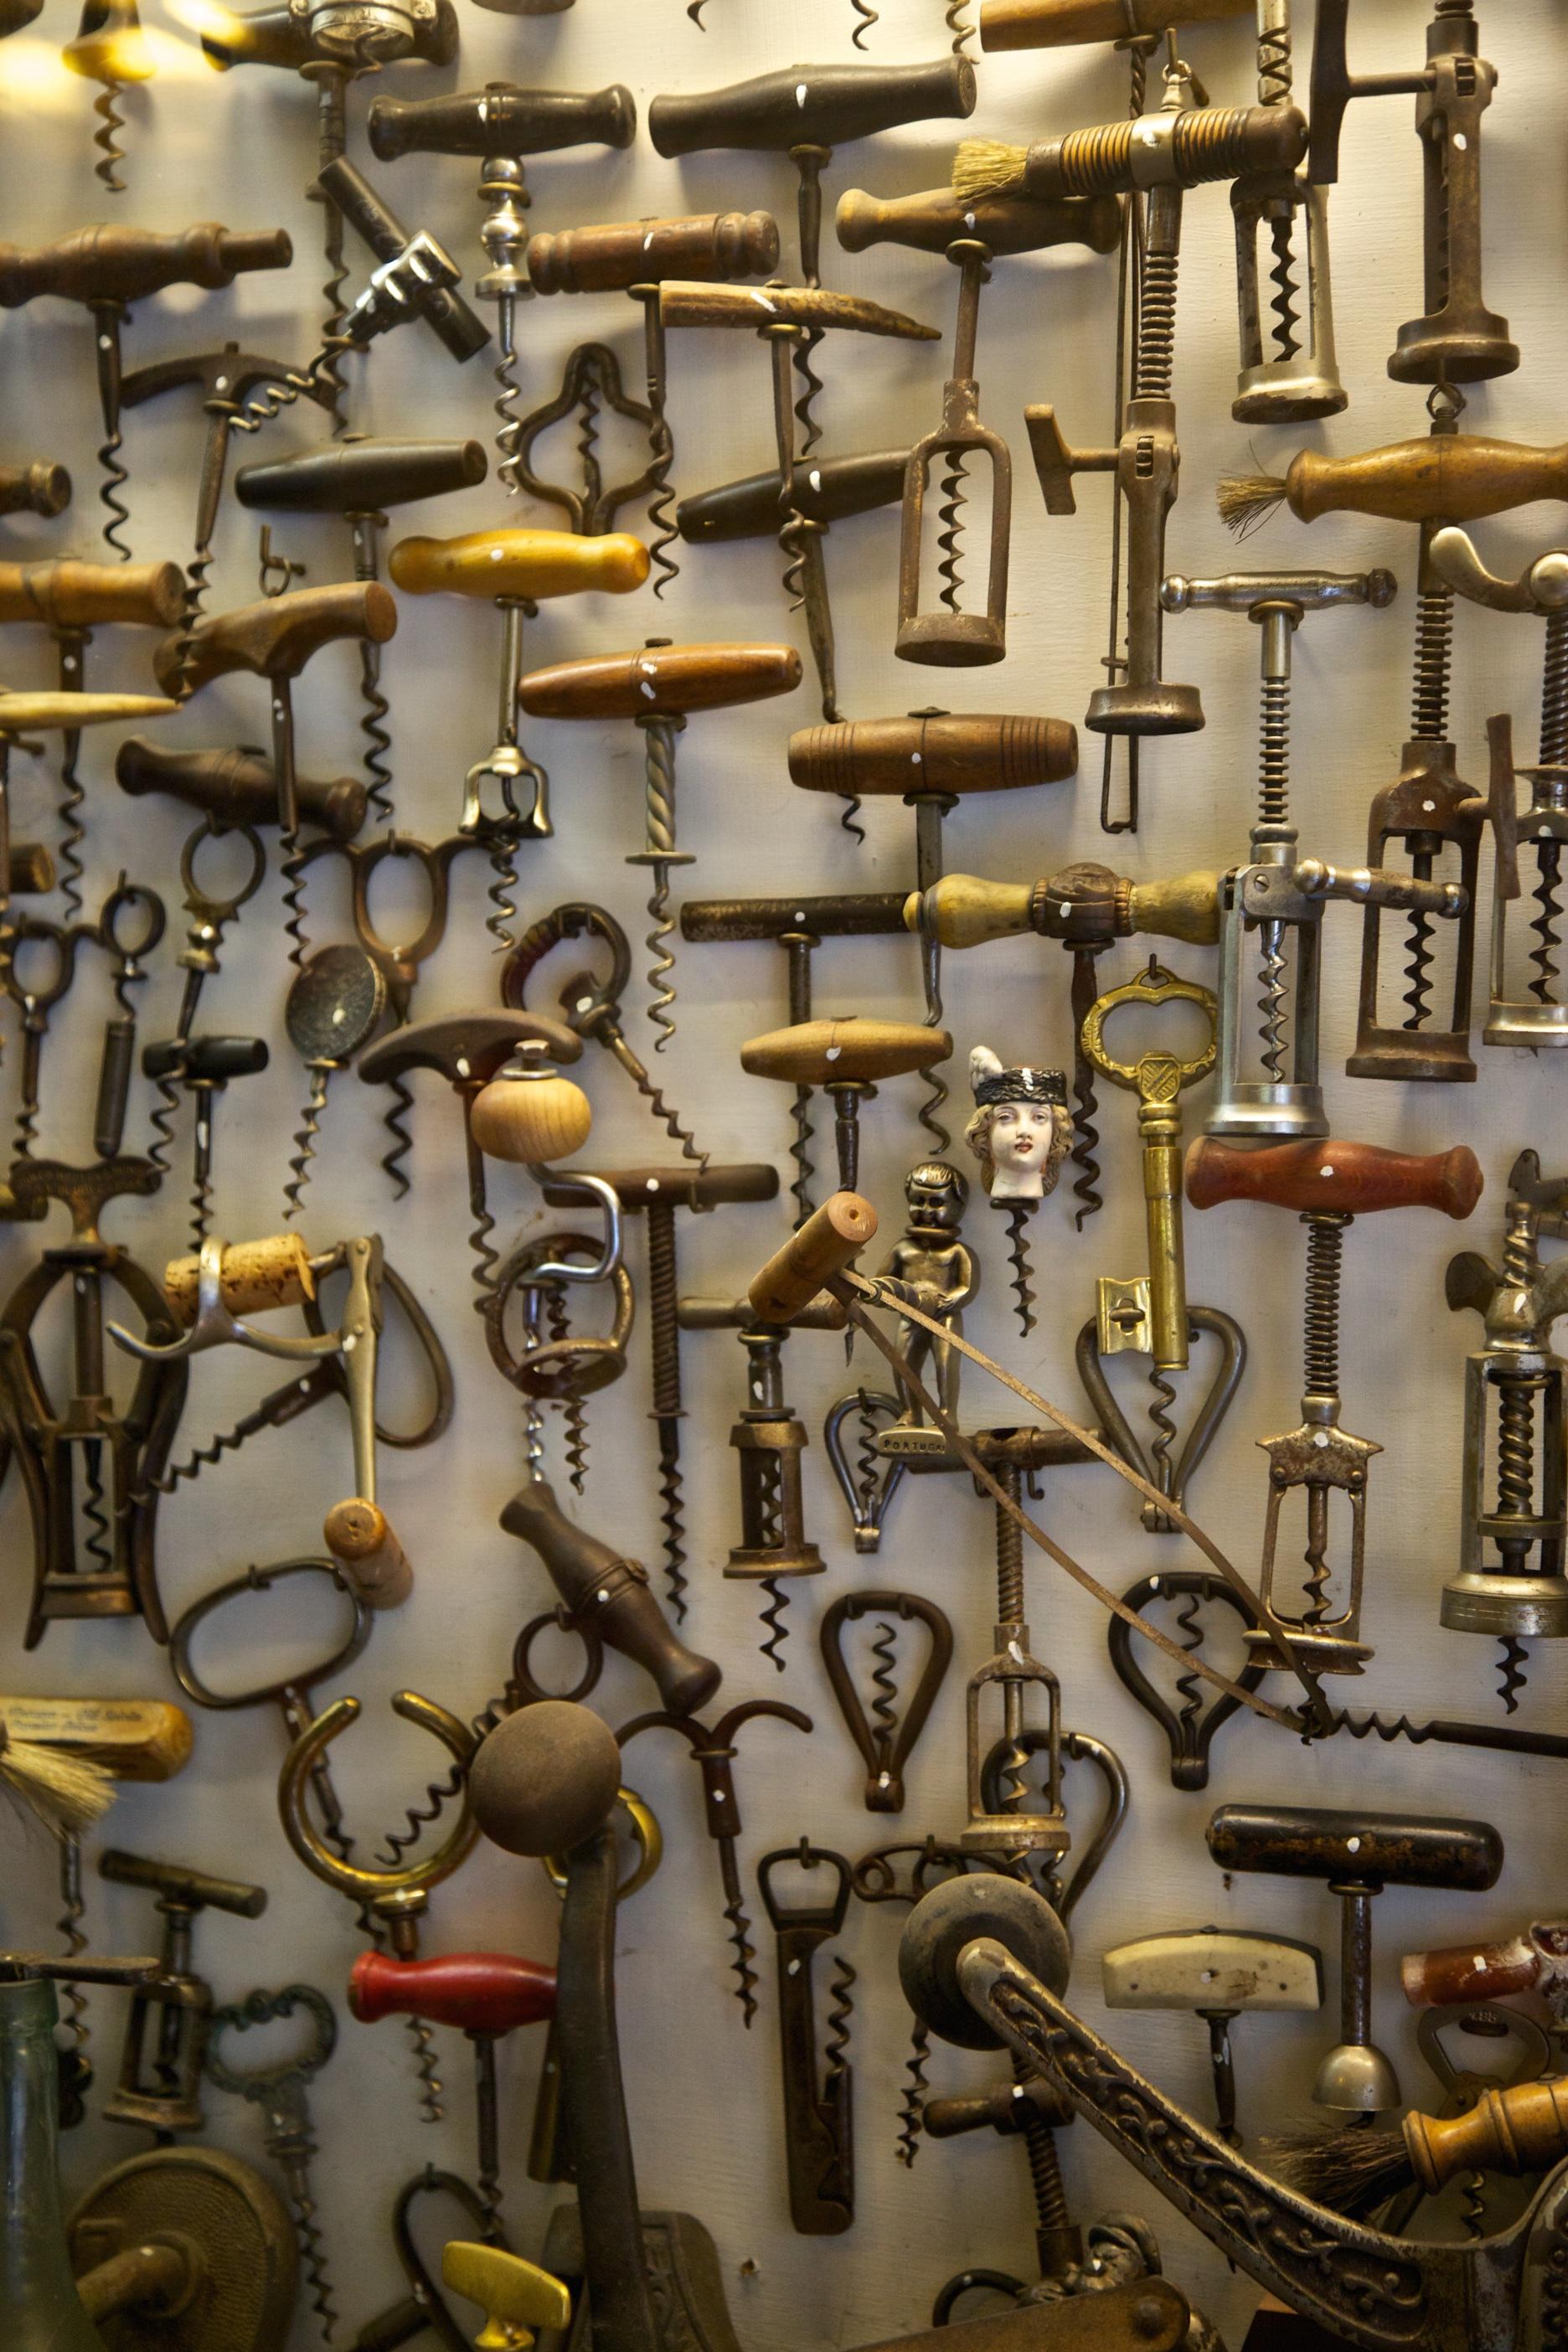 Corkscrews for screwballs.